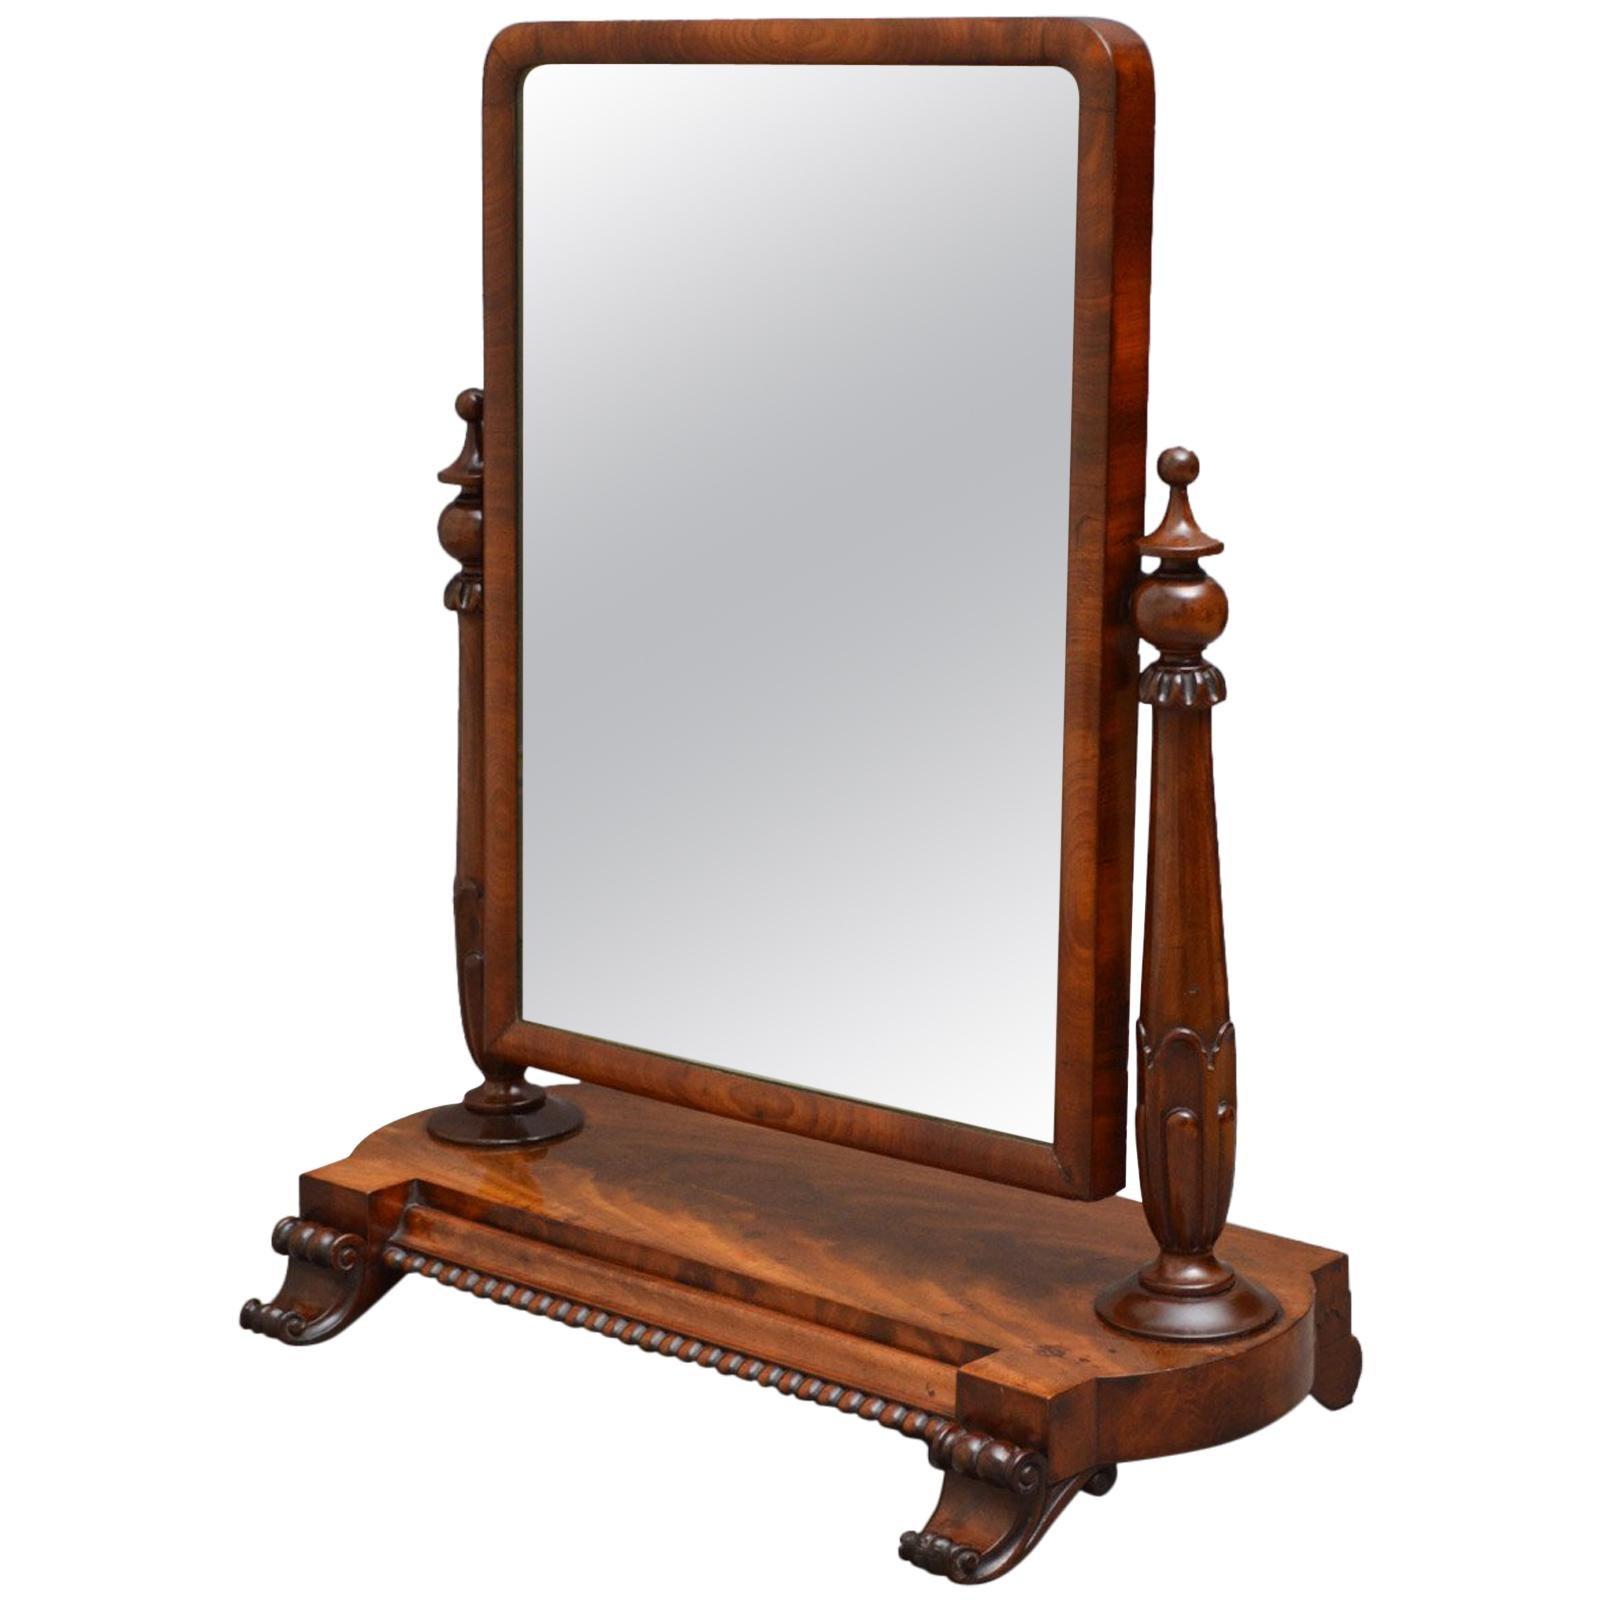 William IV Mahogany Dressing Table Mirror